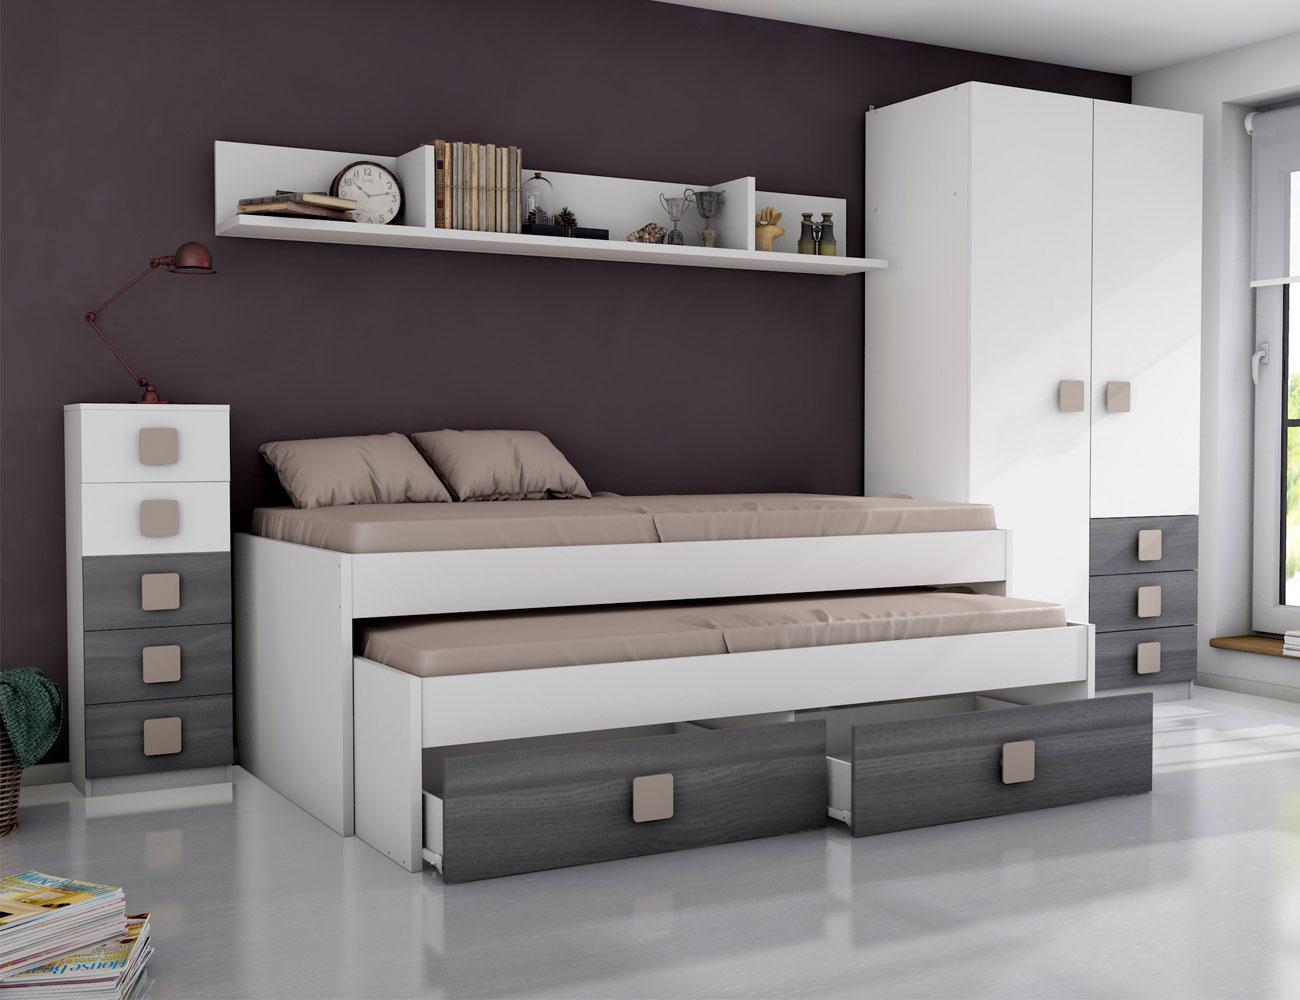 Dormitorio juvenil ceniza moka5